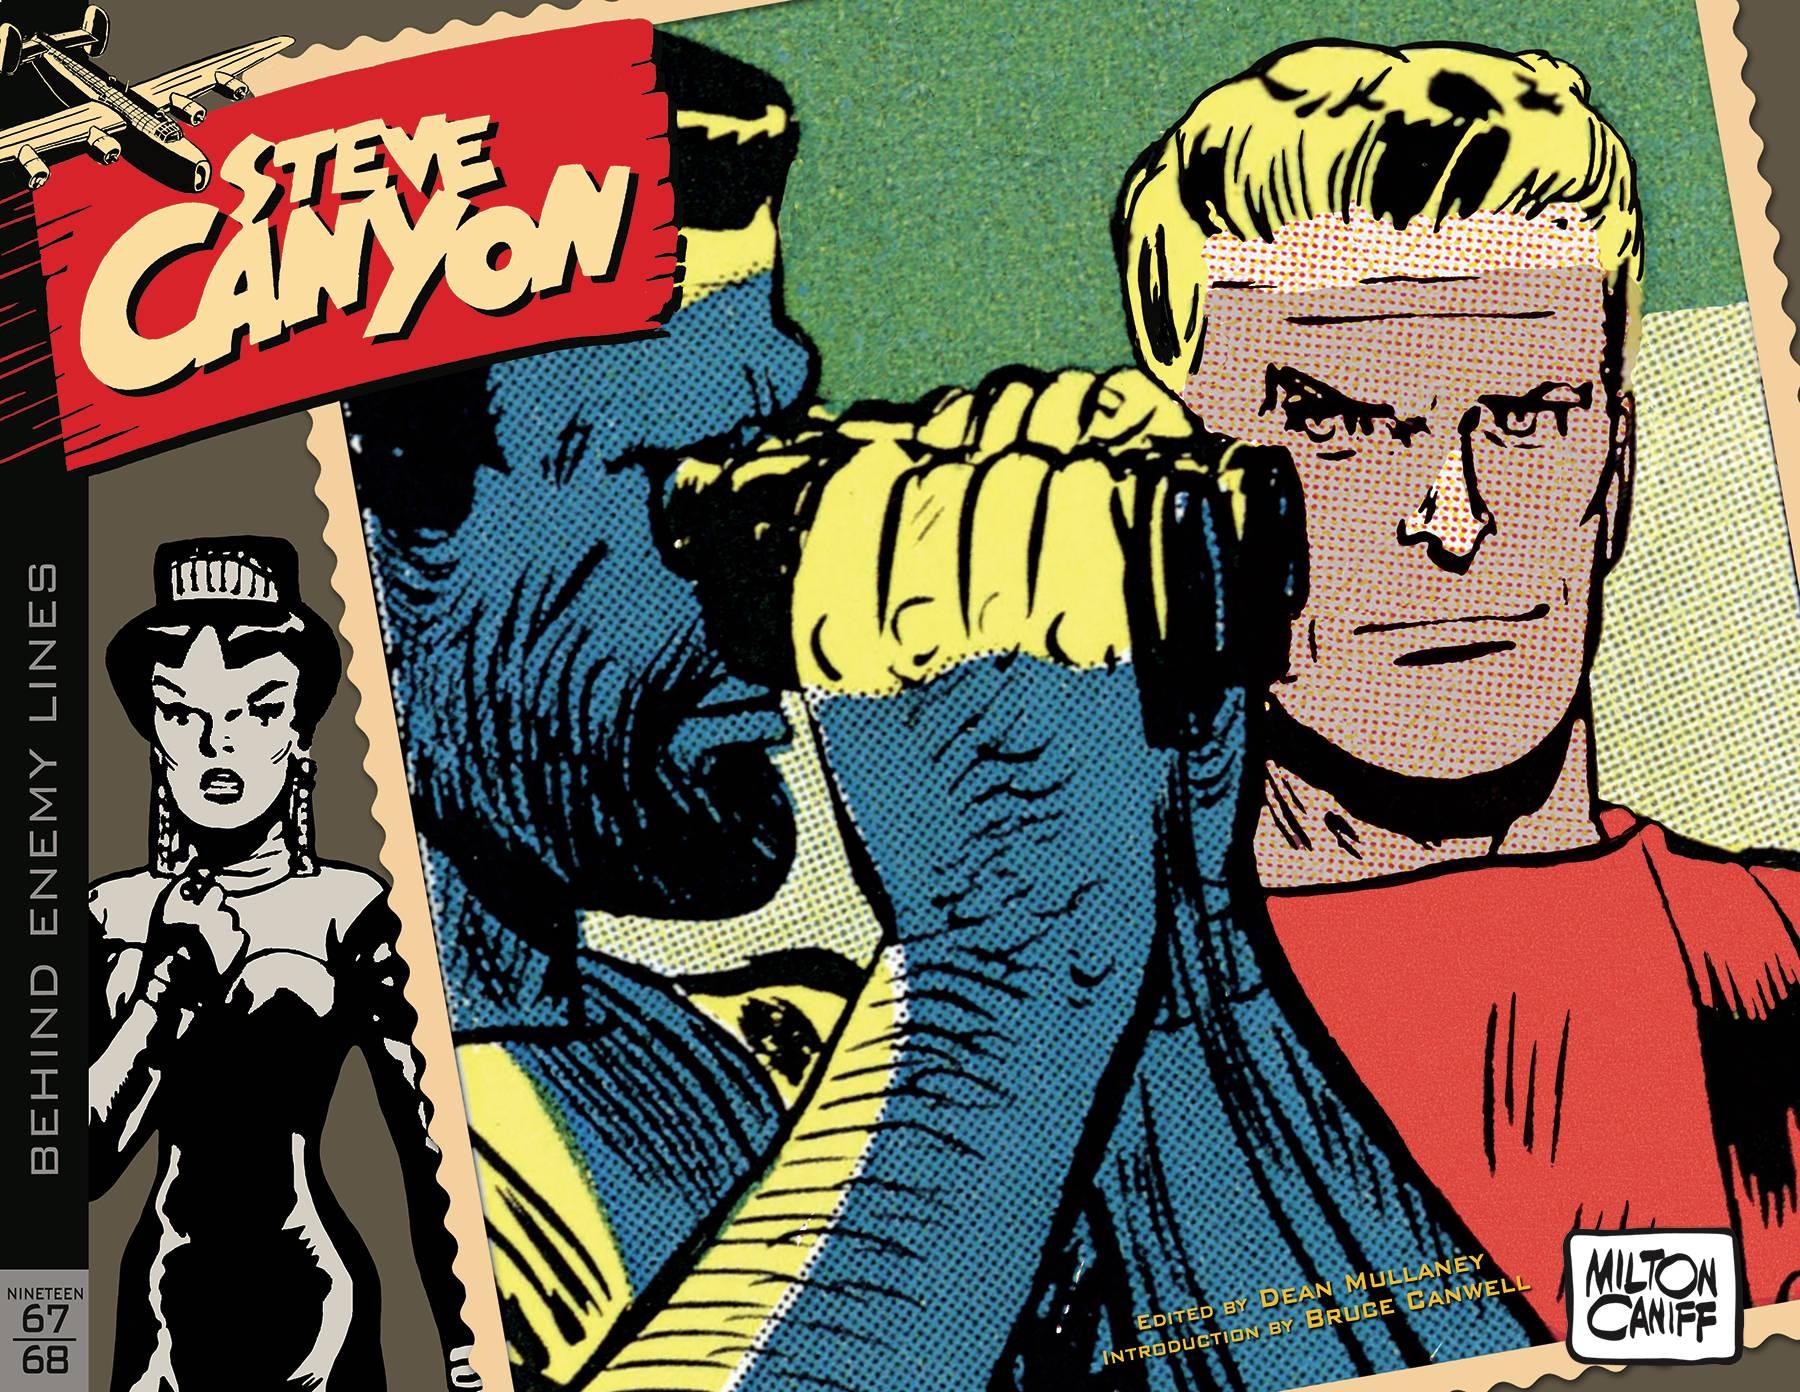 STEVE CANYON HC VOL 11 1967 - 1968